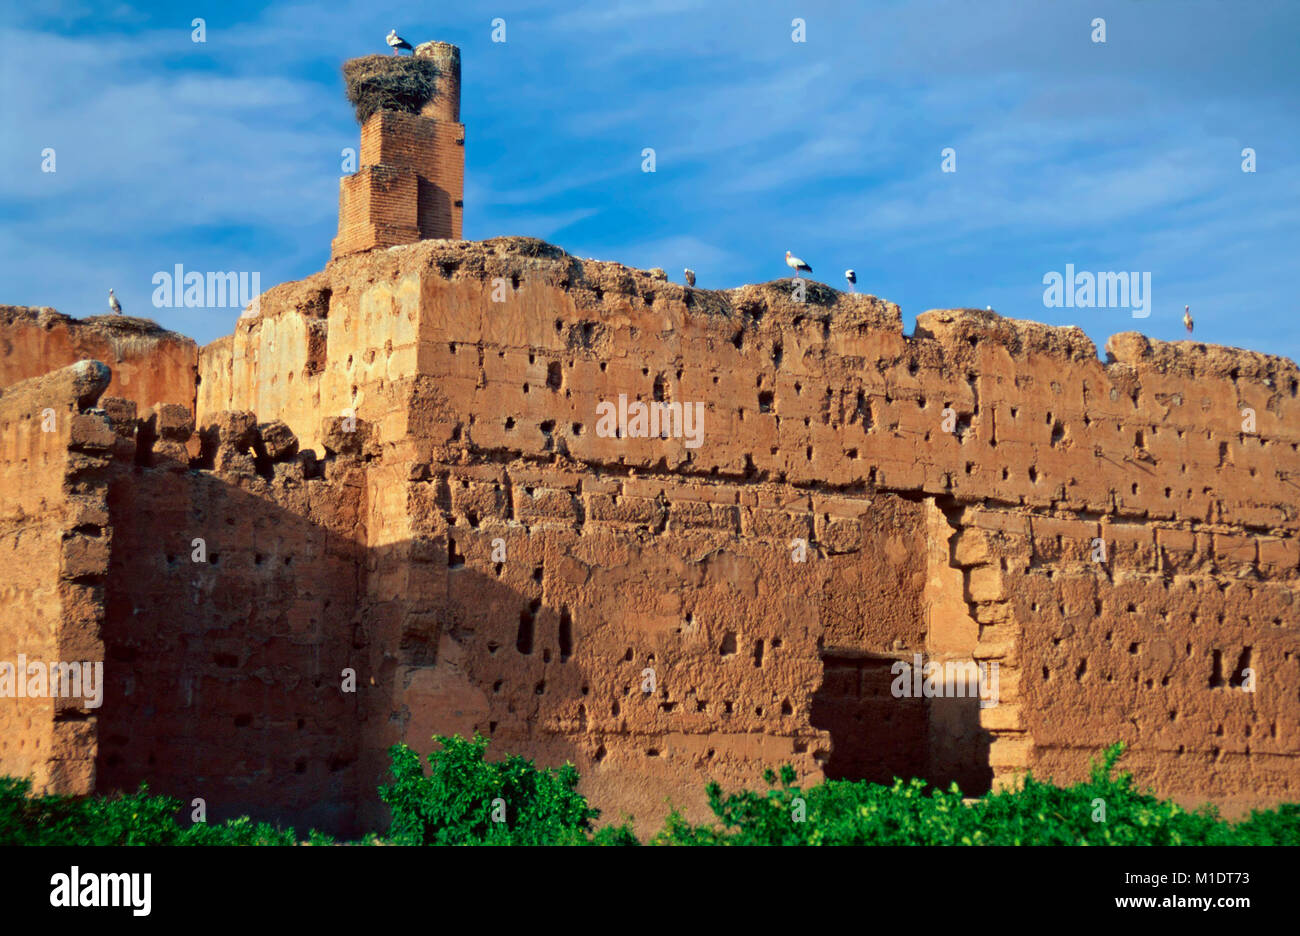 Stork nests,El Badi Palace,Marrkesh,Morocco Stock Photo